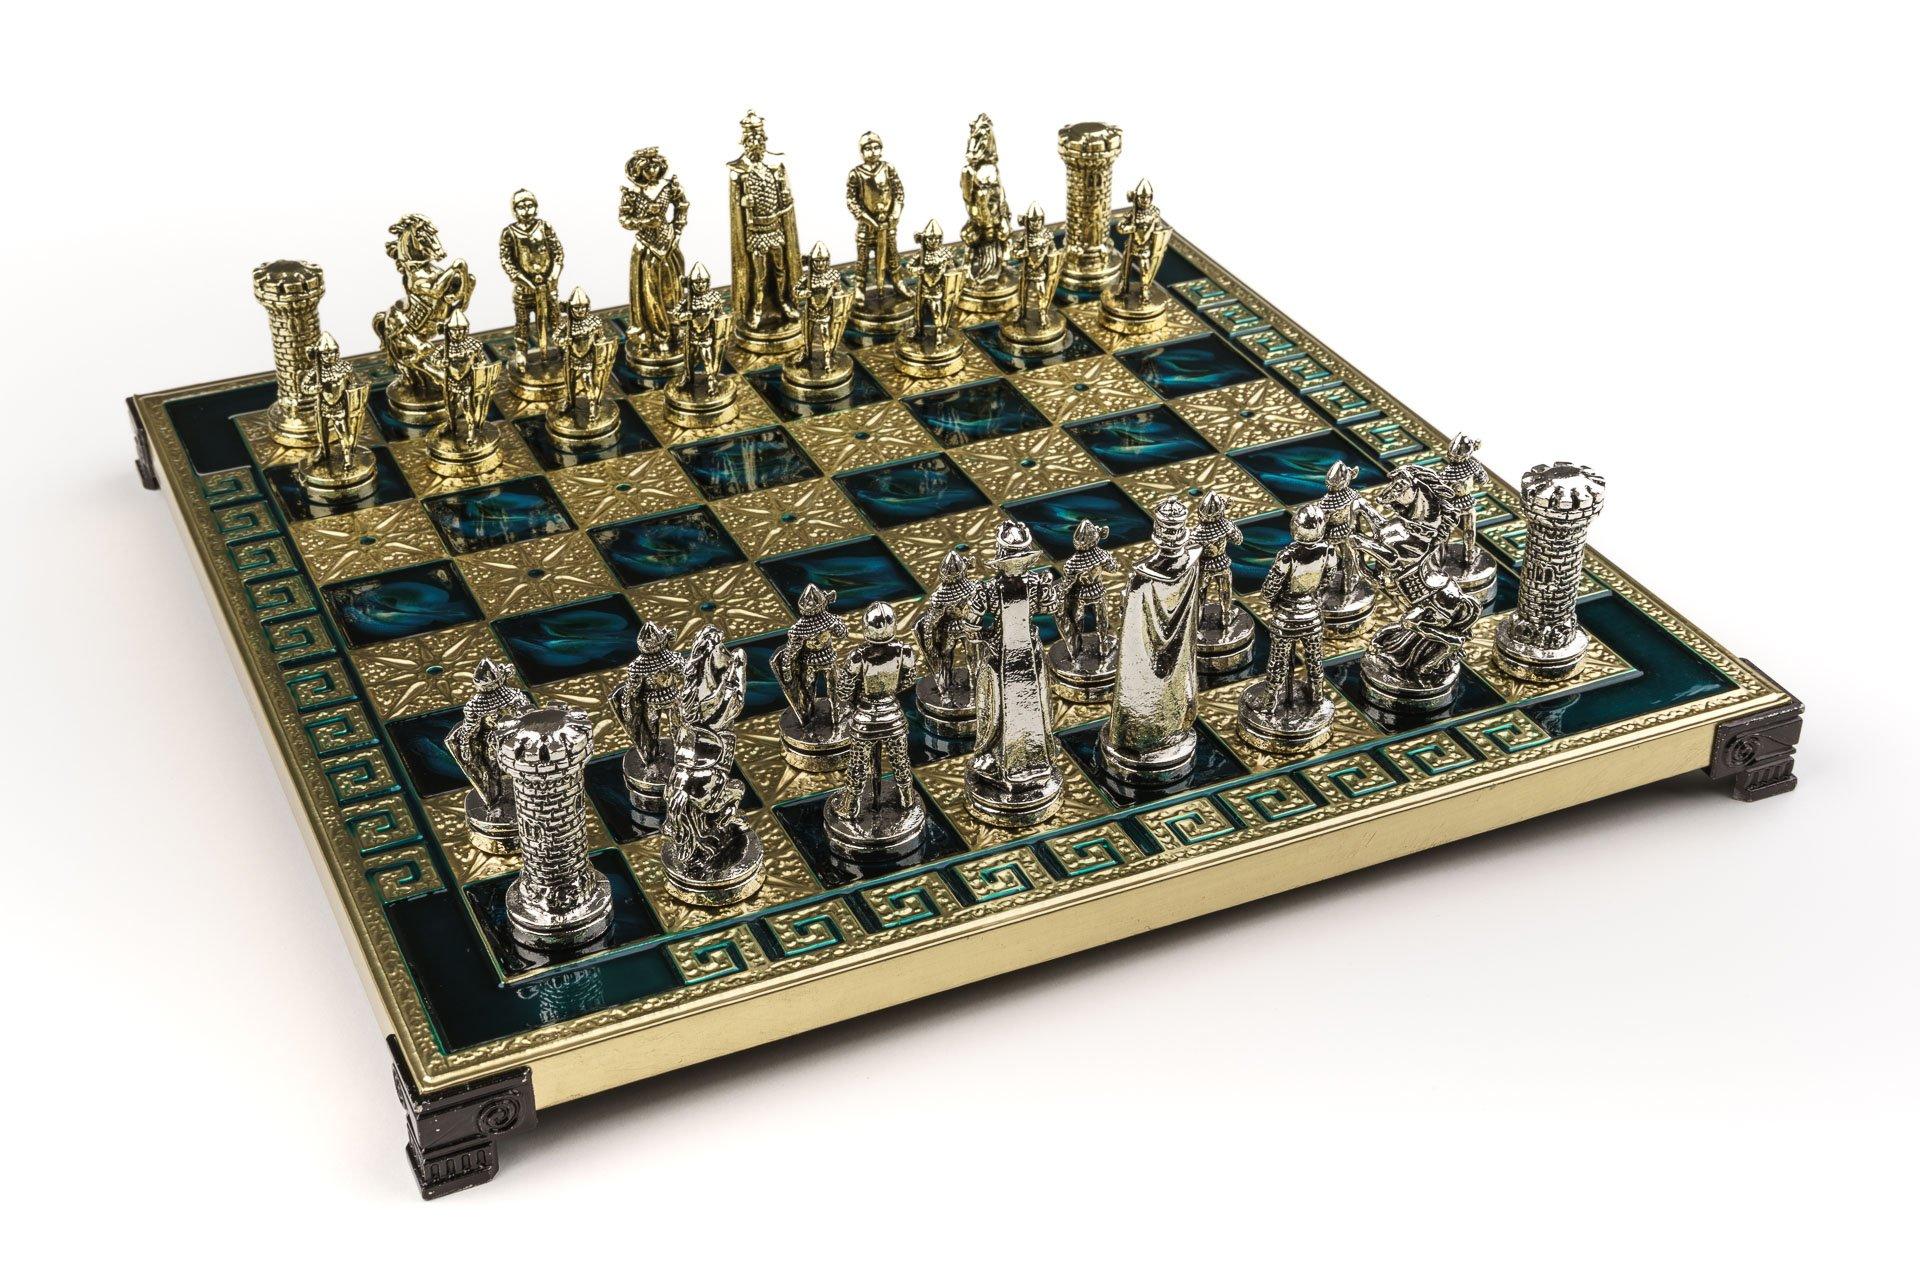 Handmade Maria Stuart Metal Chess Set in Wooden Box